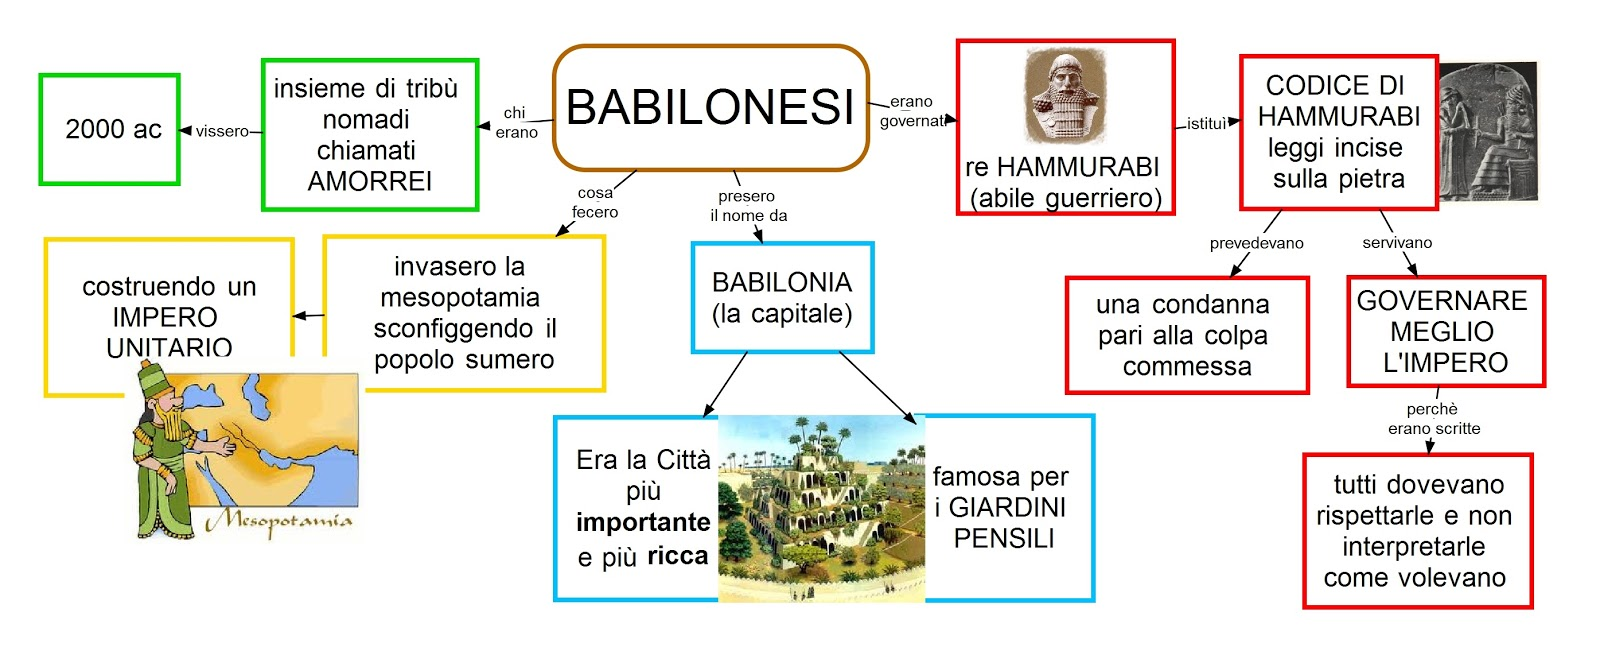 2 BABILONESI - dislessia-passodopopasso2